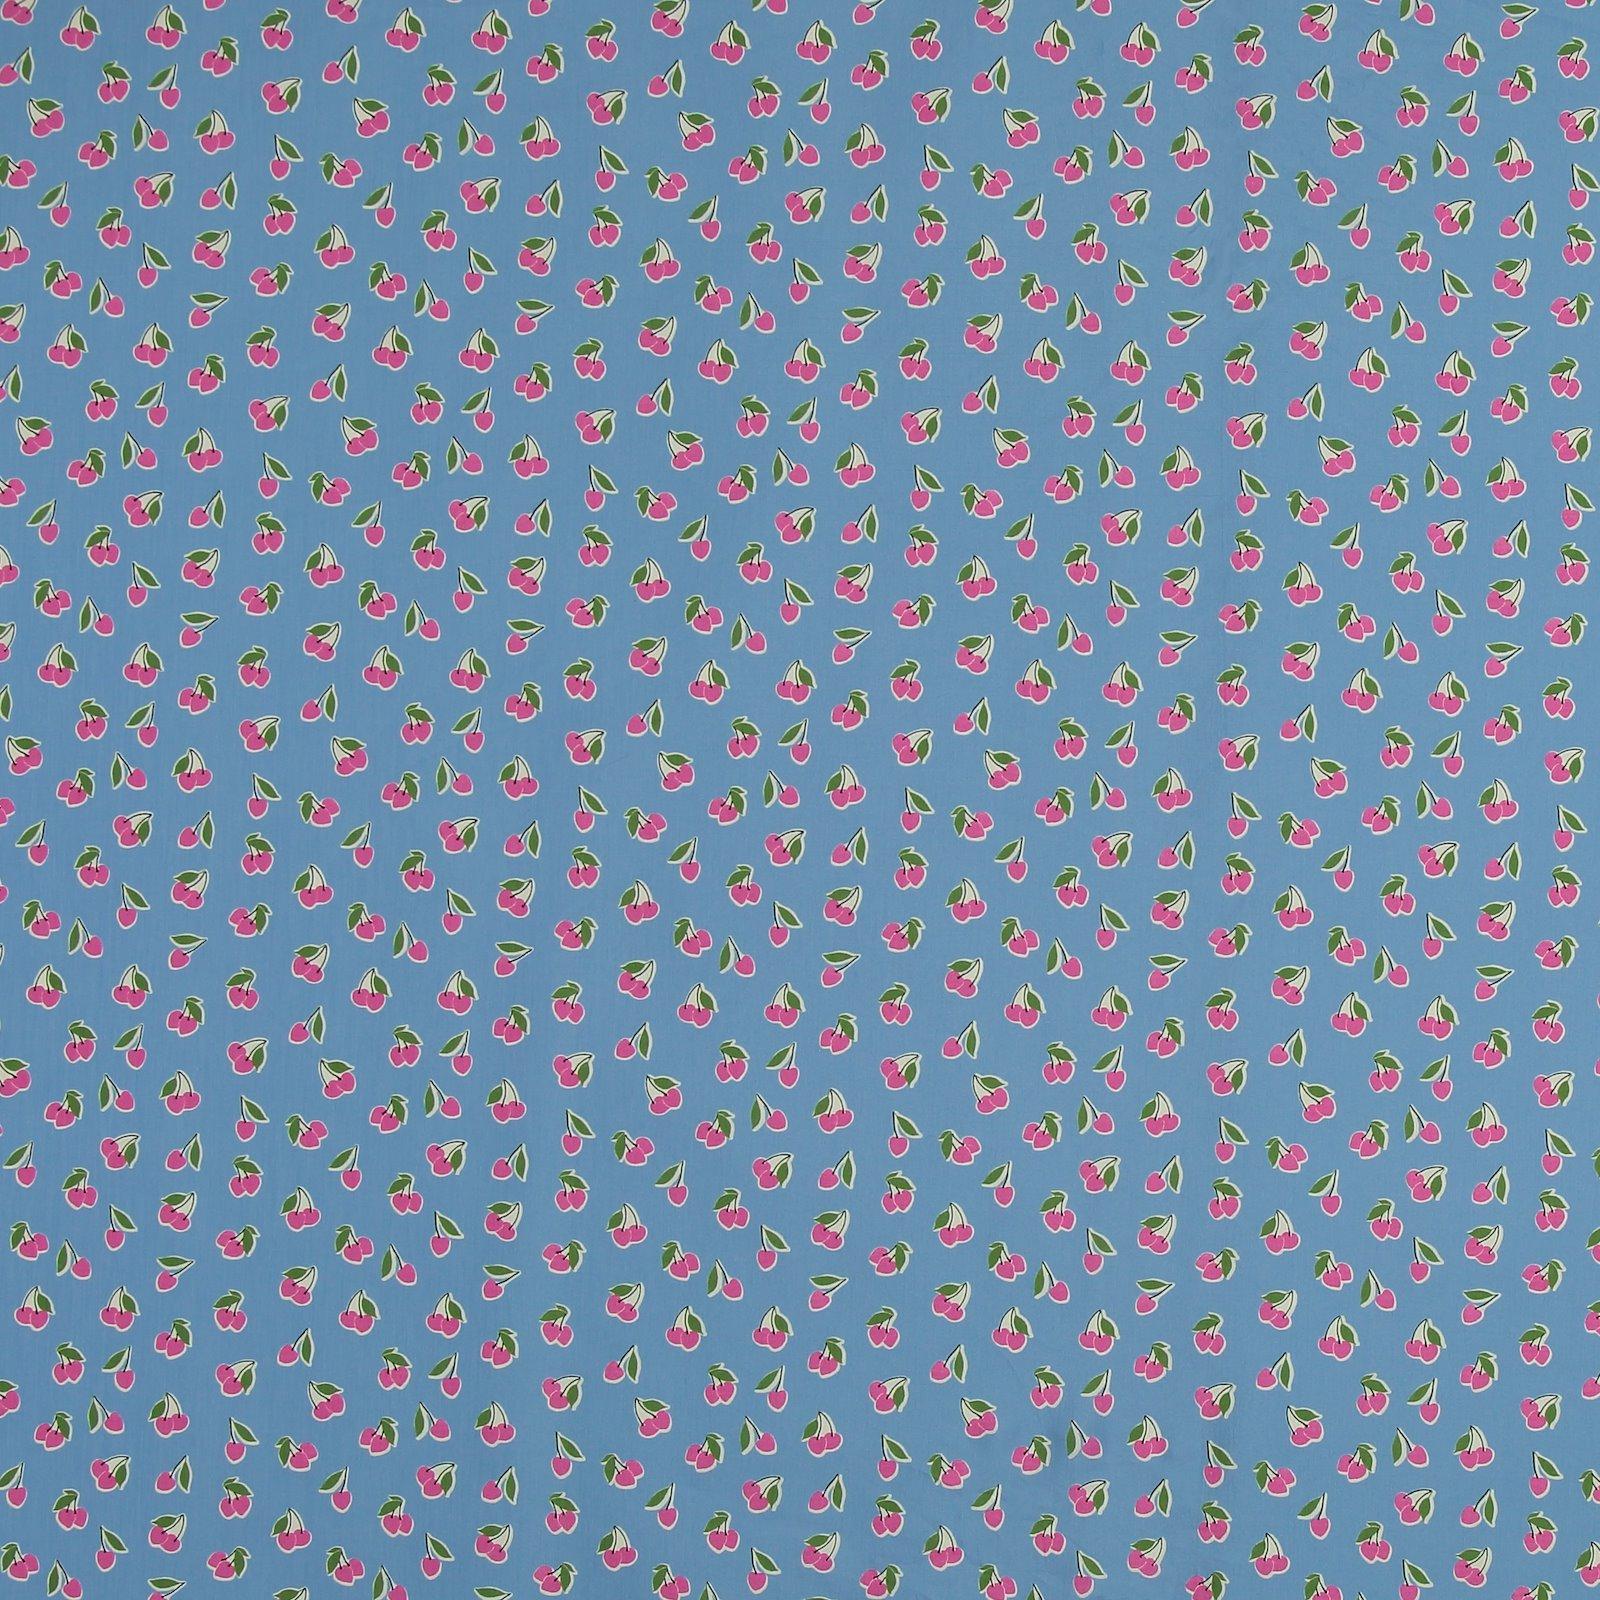 Cotton/viscose cobalt blue with cherry 501874_pack_sp